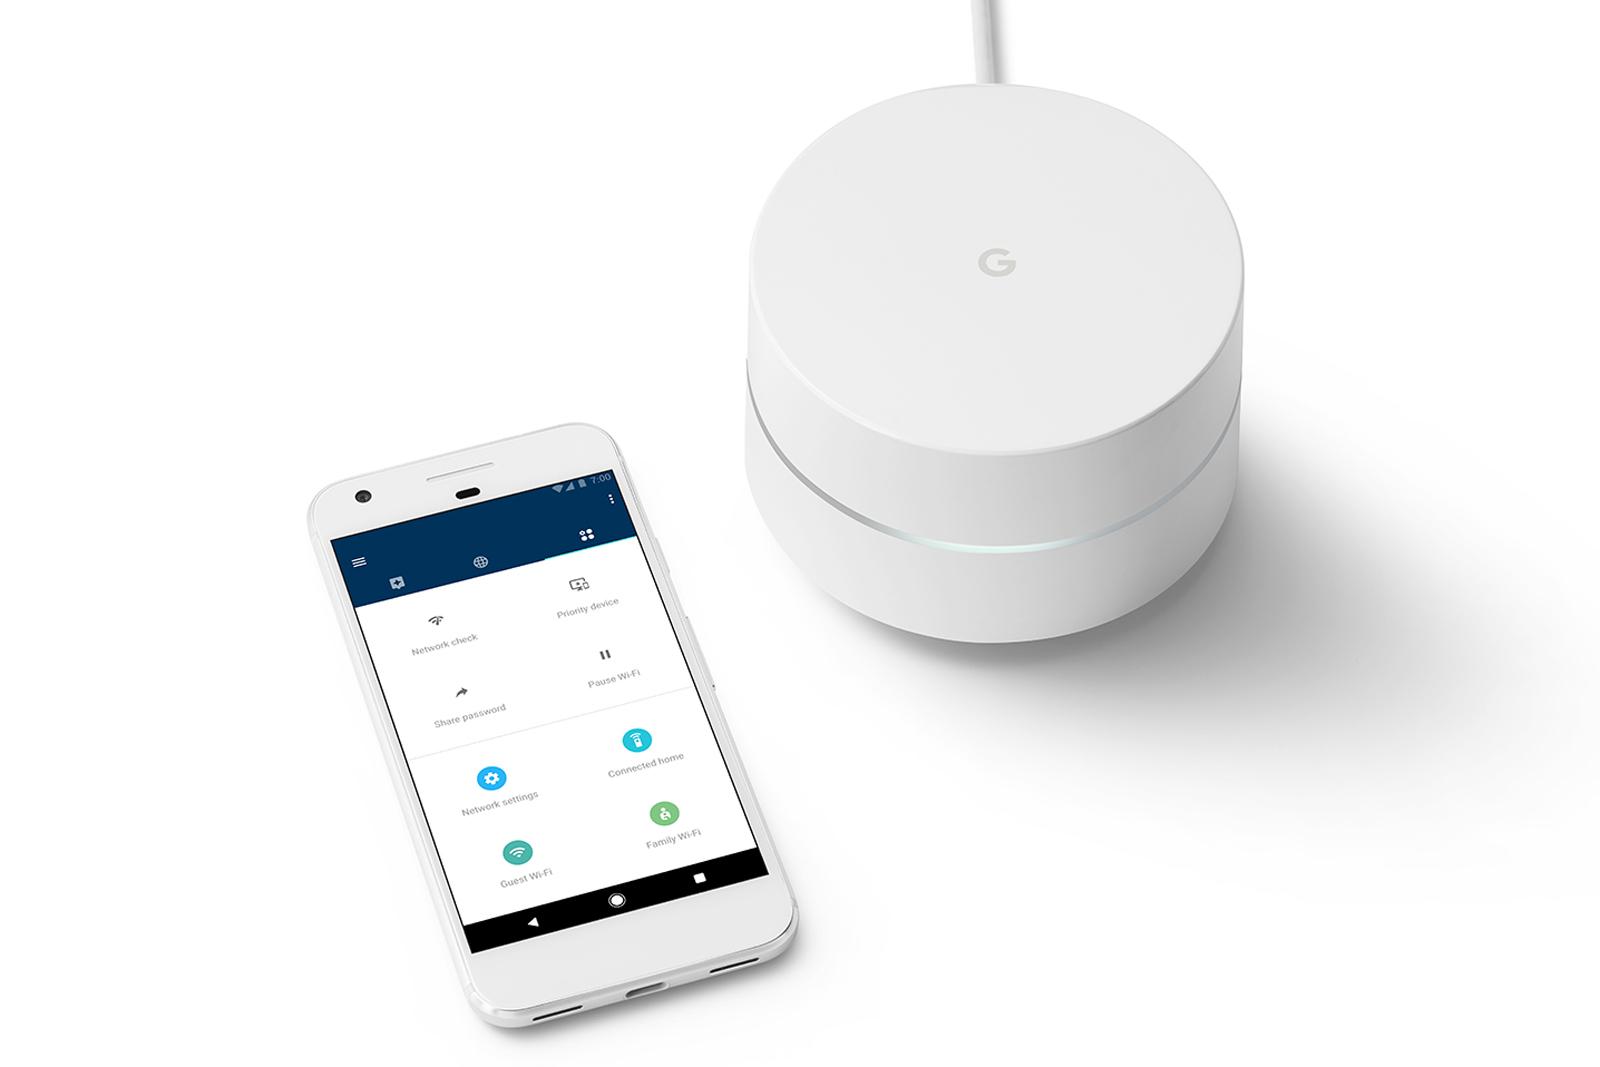 Google WiFi 路由器帮你简化全家范围的无线网络铺设